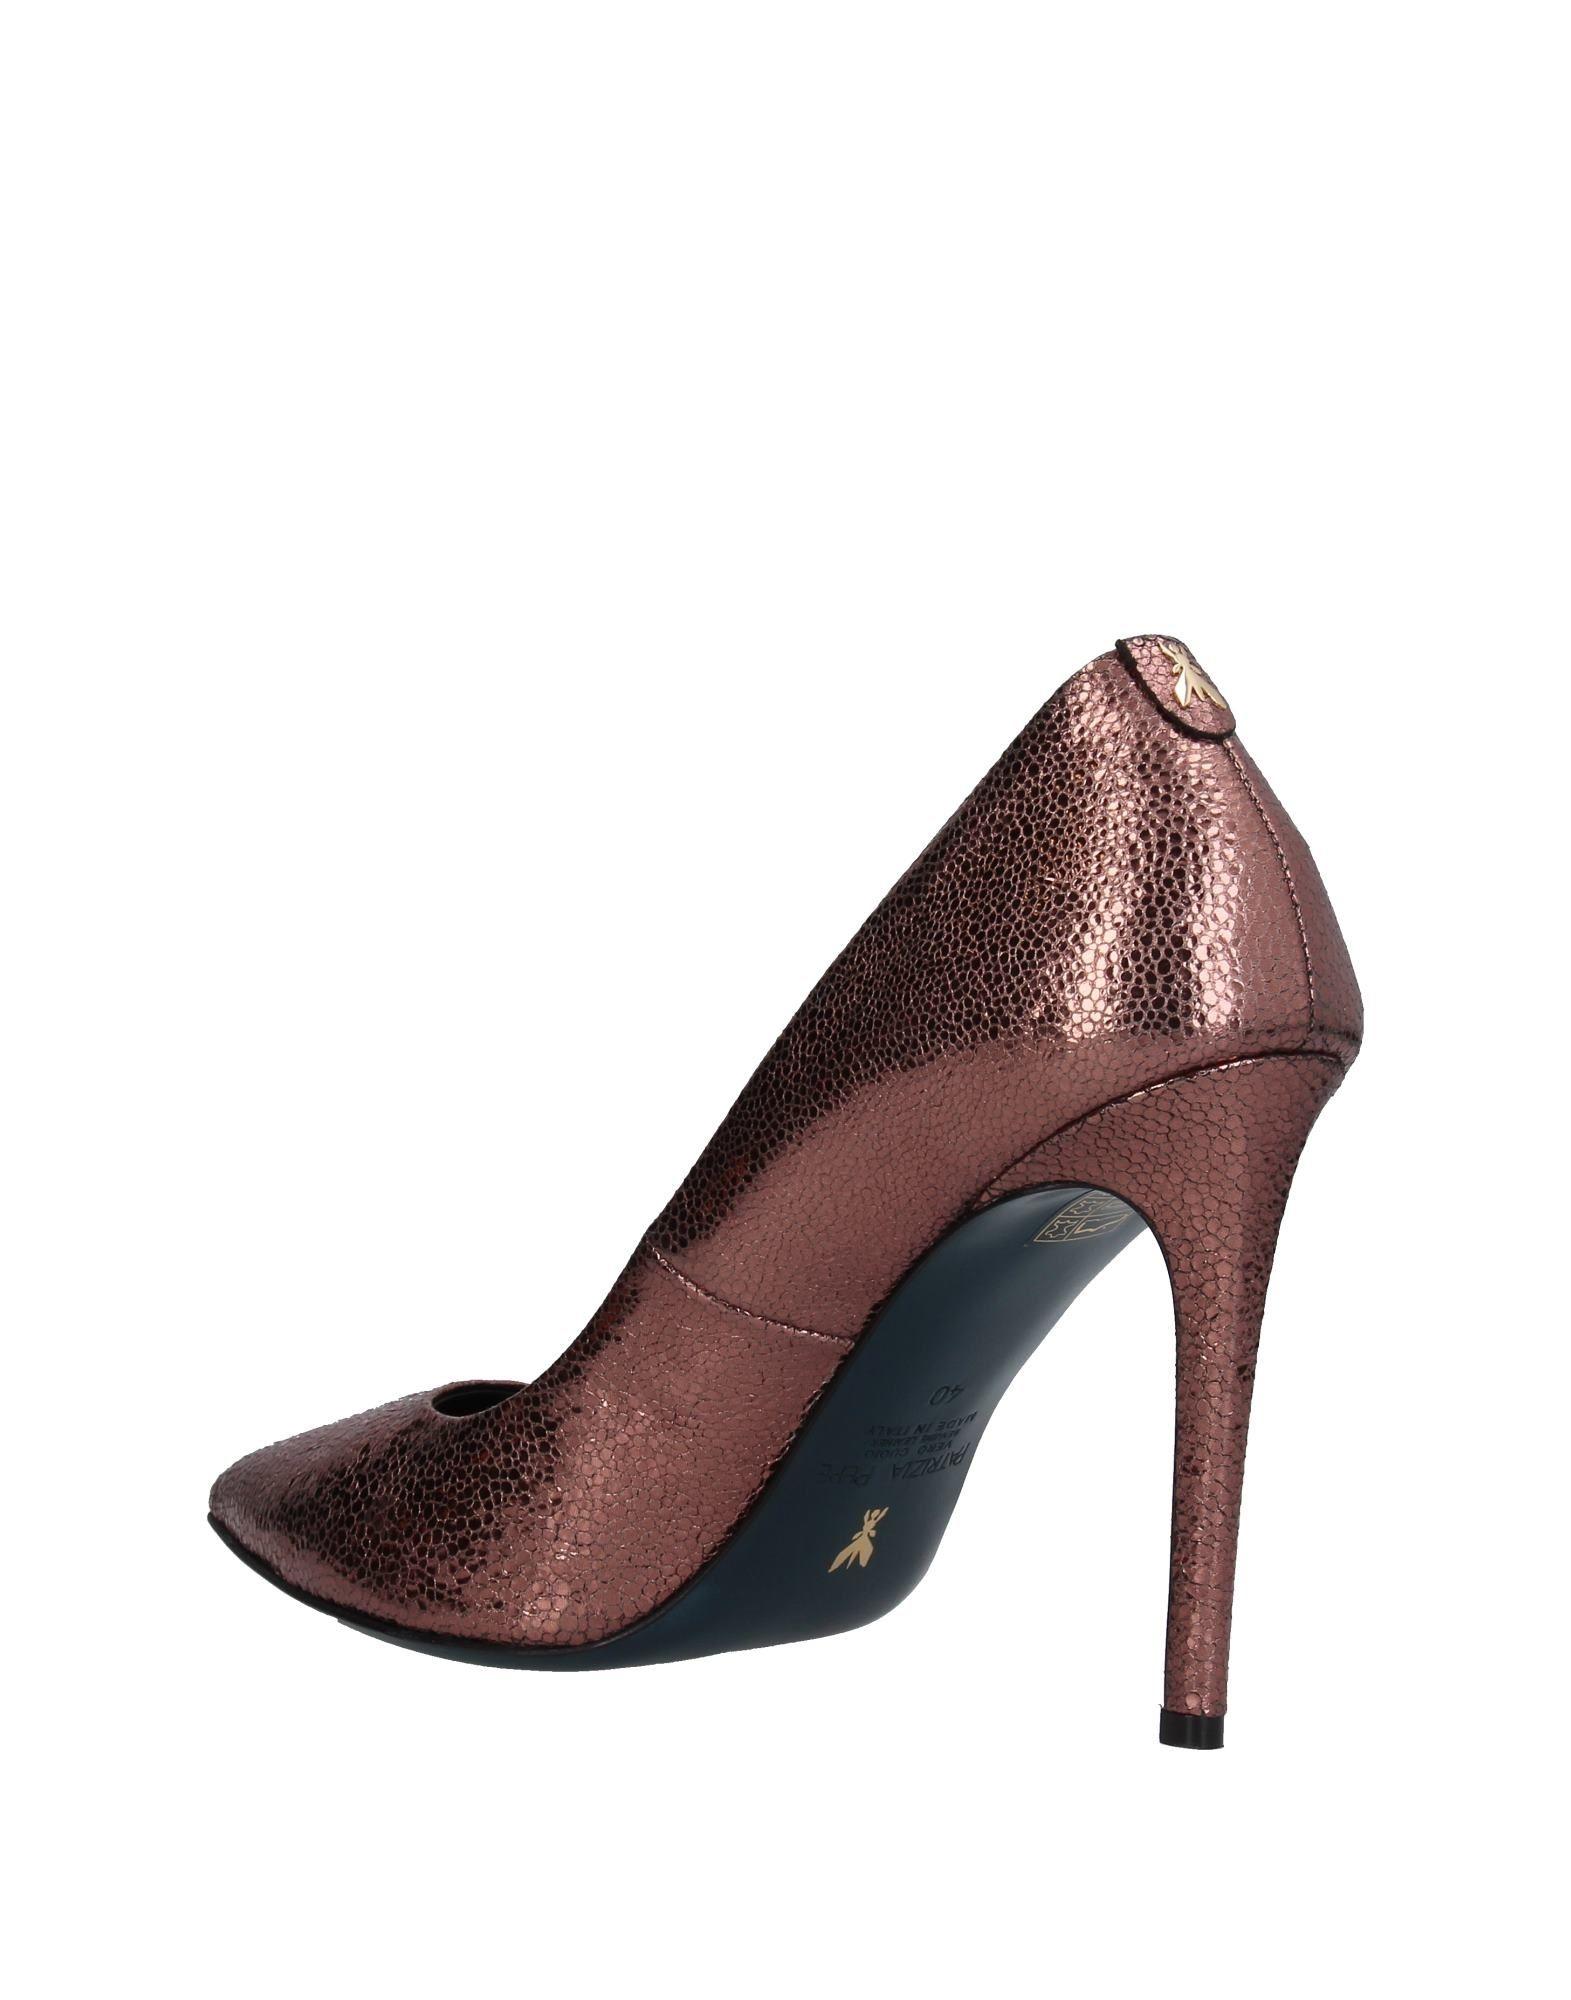 Stilvolle billige Schuhe Patrizia Pepe Pumps Damen  11366161MI